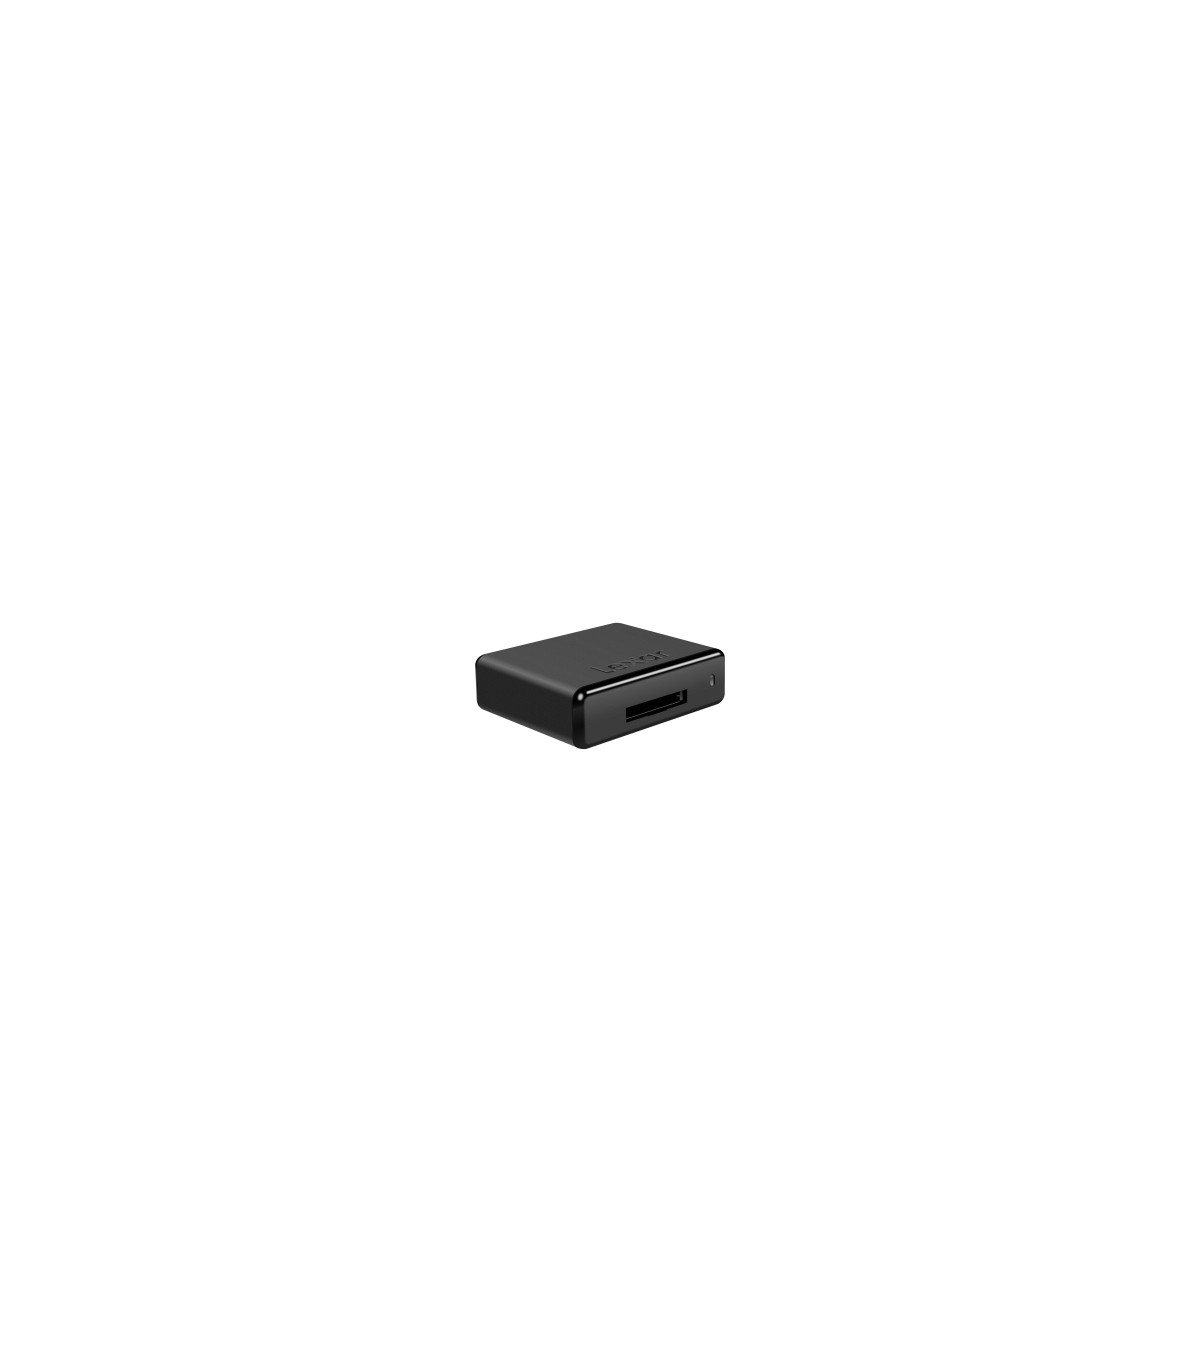 lexar workflow xr2 usb 30 xqd card reader professional